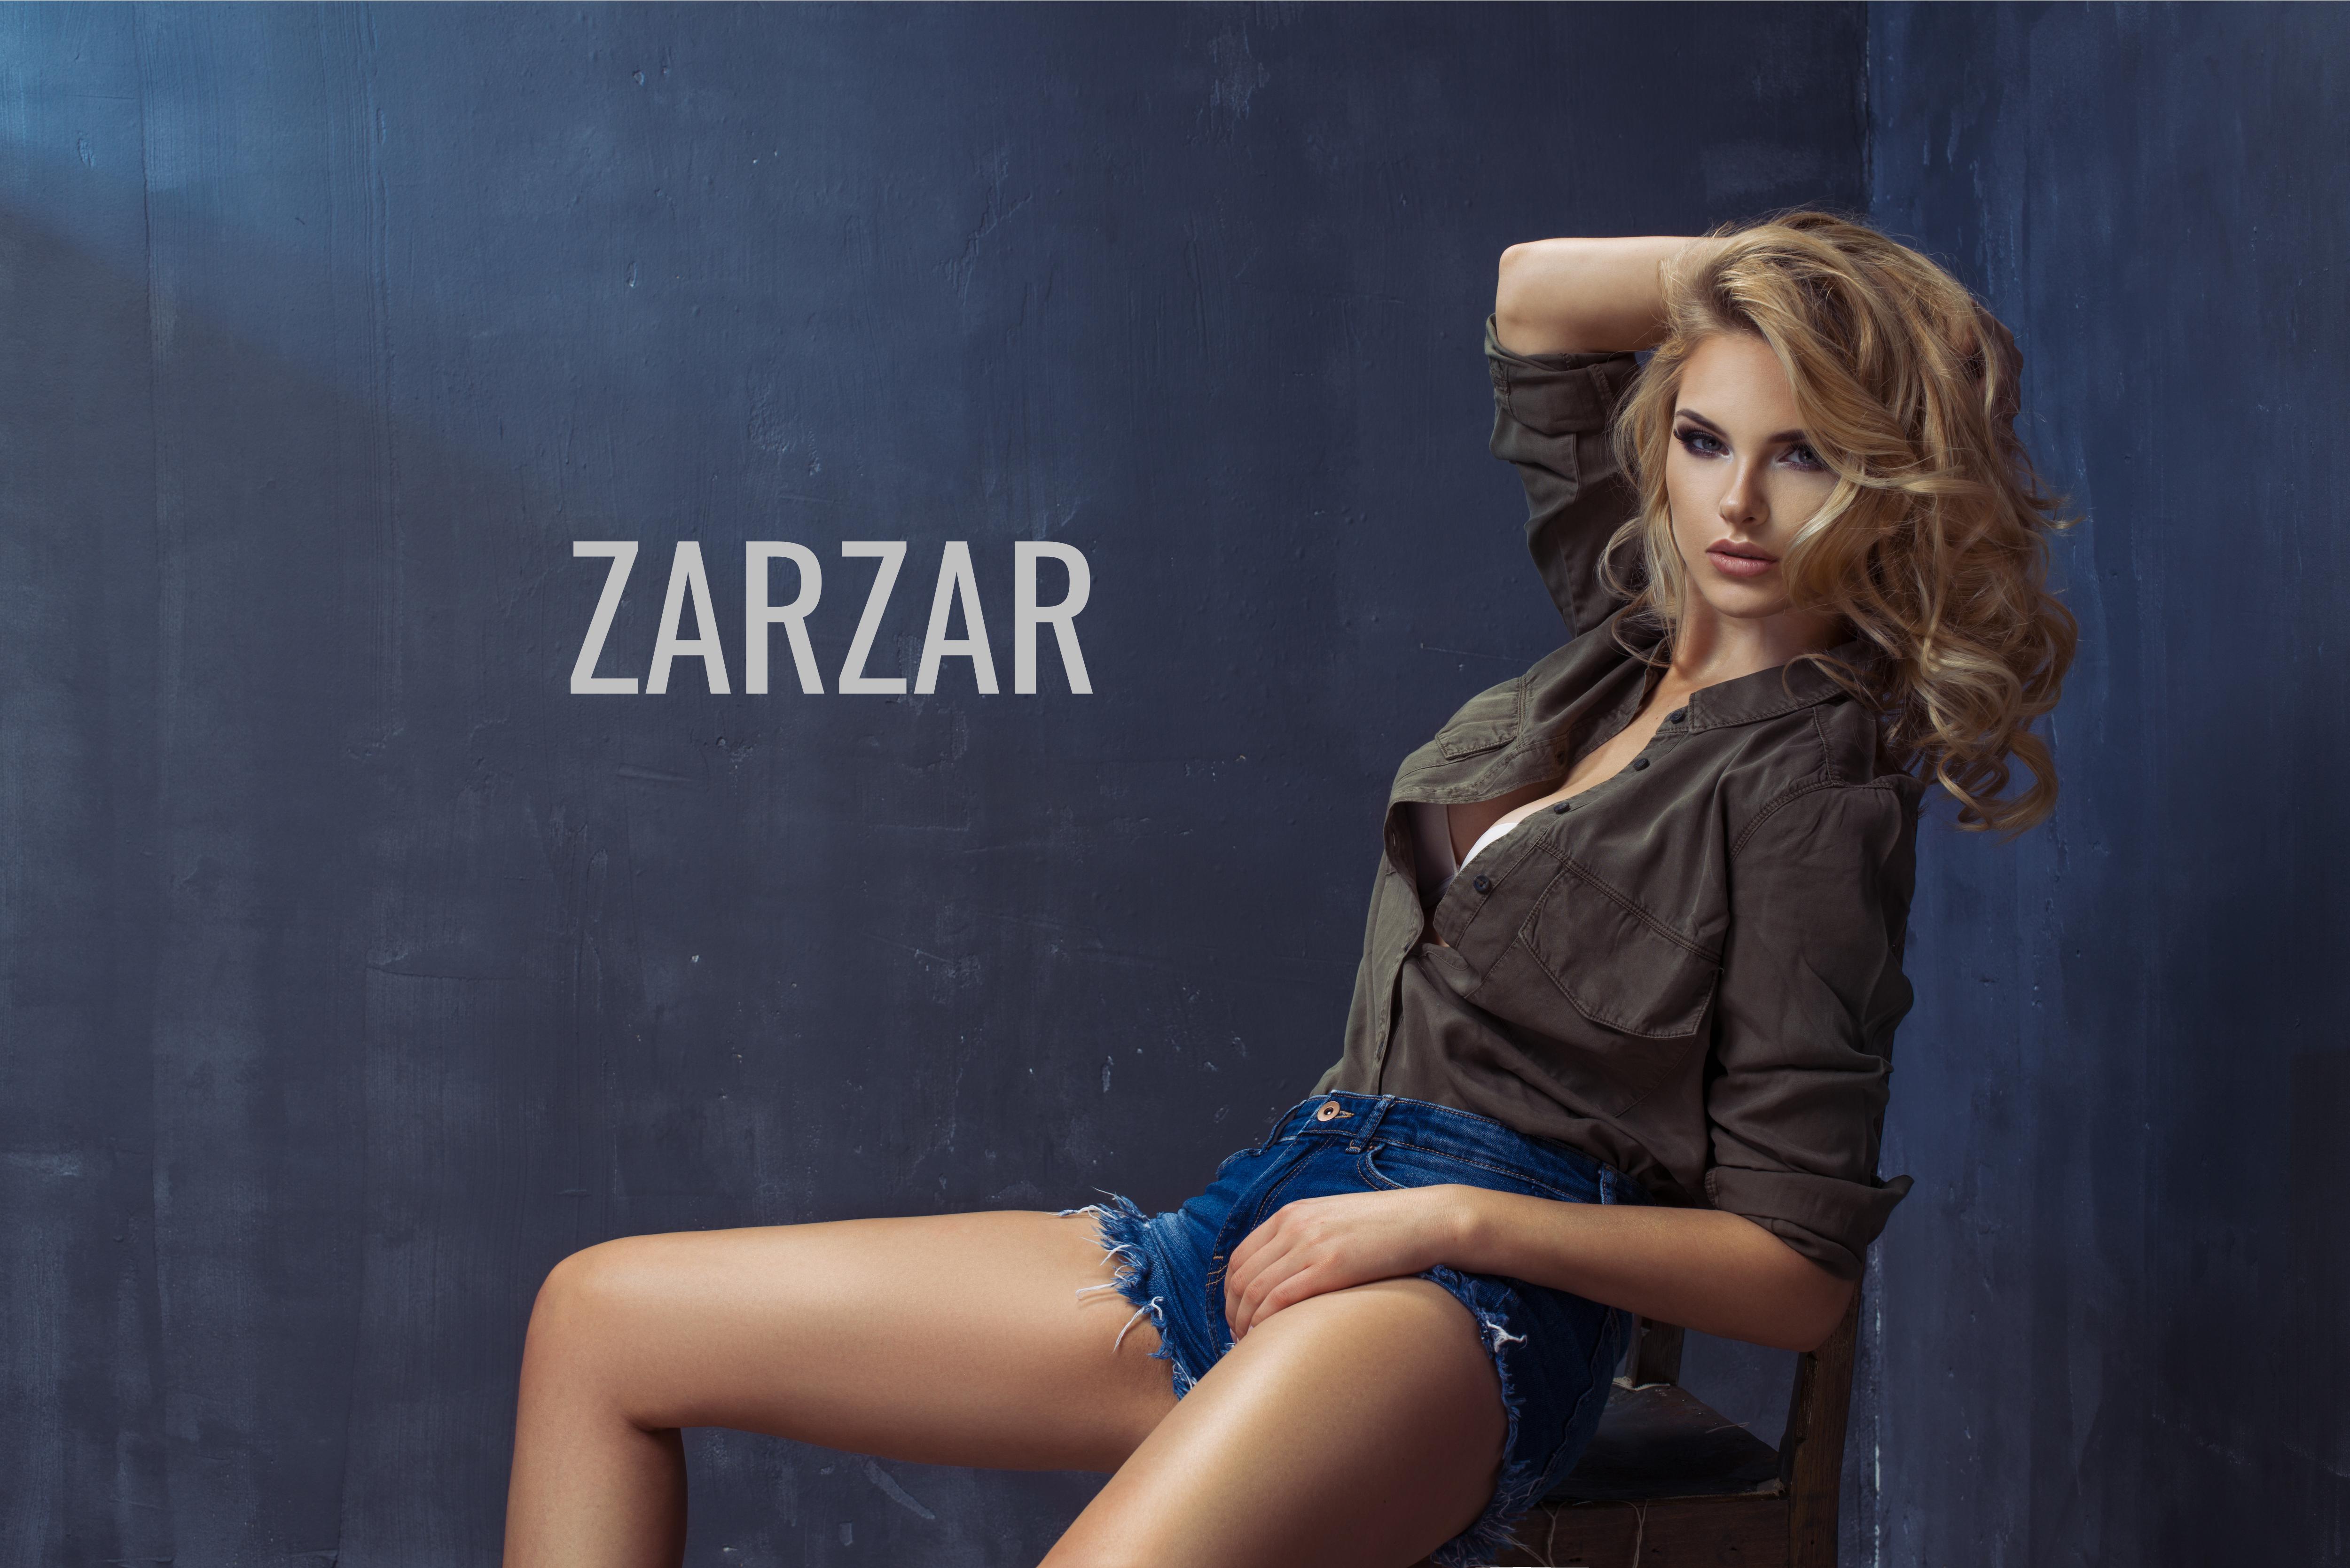 ZARZAR MODELS   Top Modeling Agency For Women, Teens, & Teenagers (Teenage Girls).